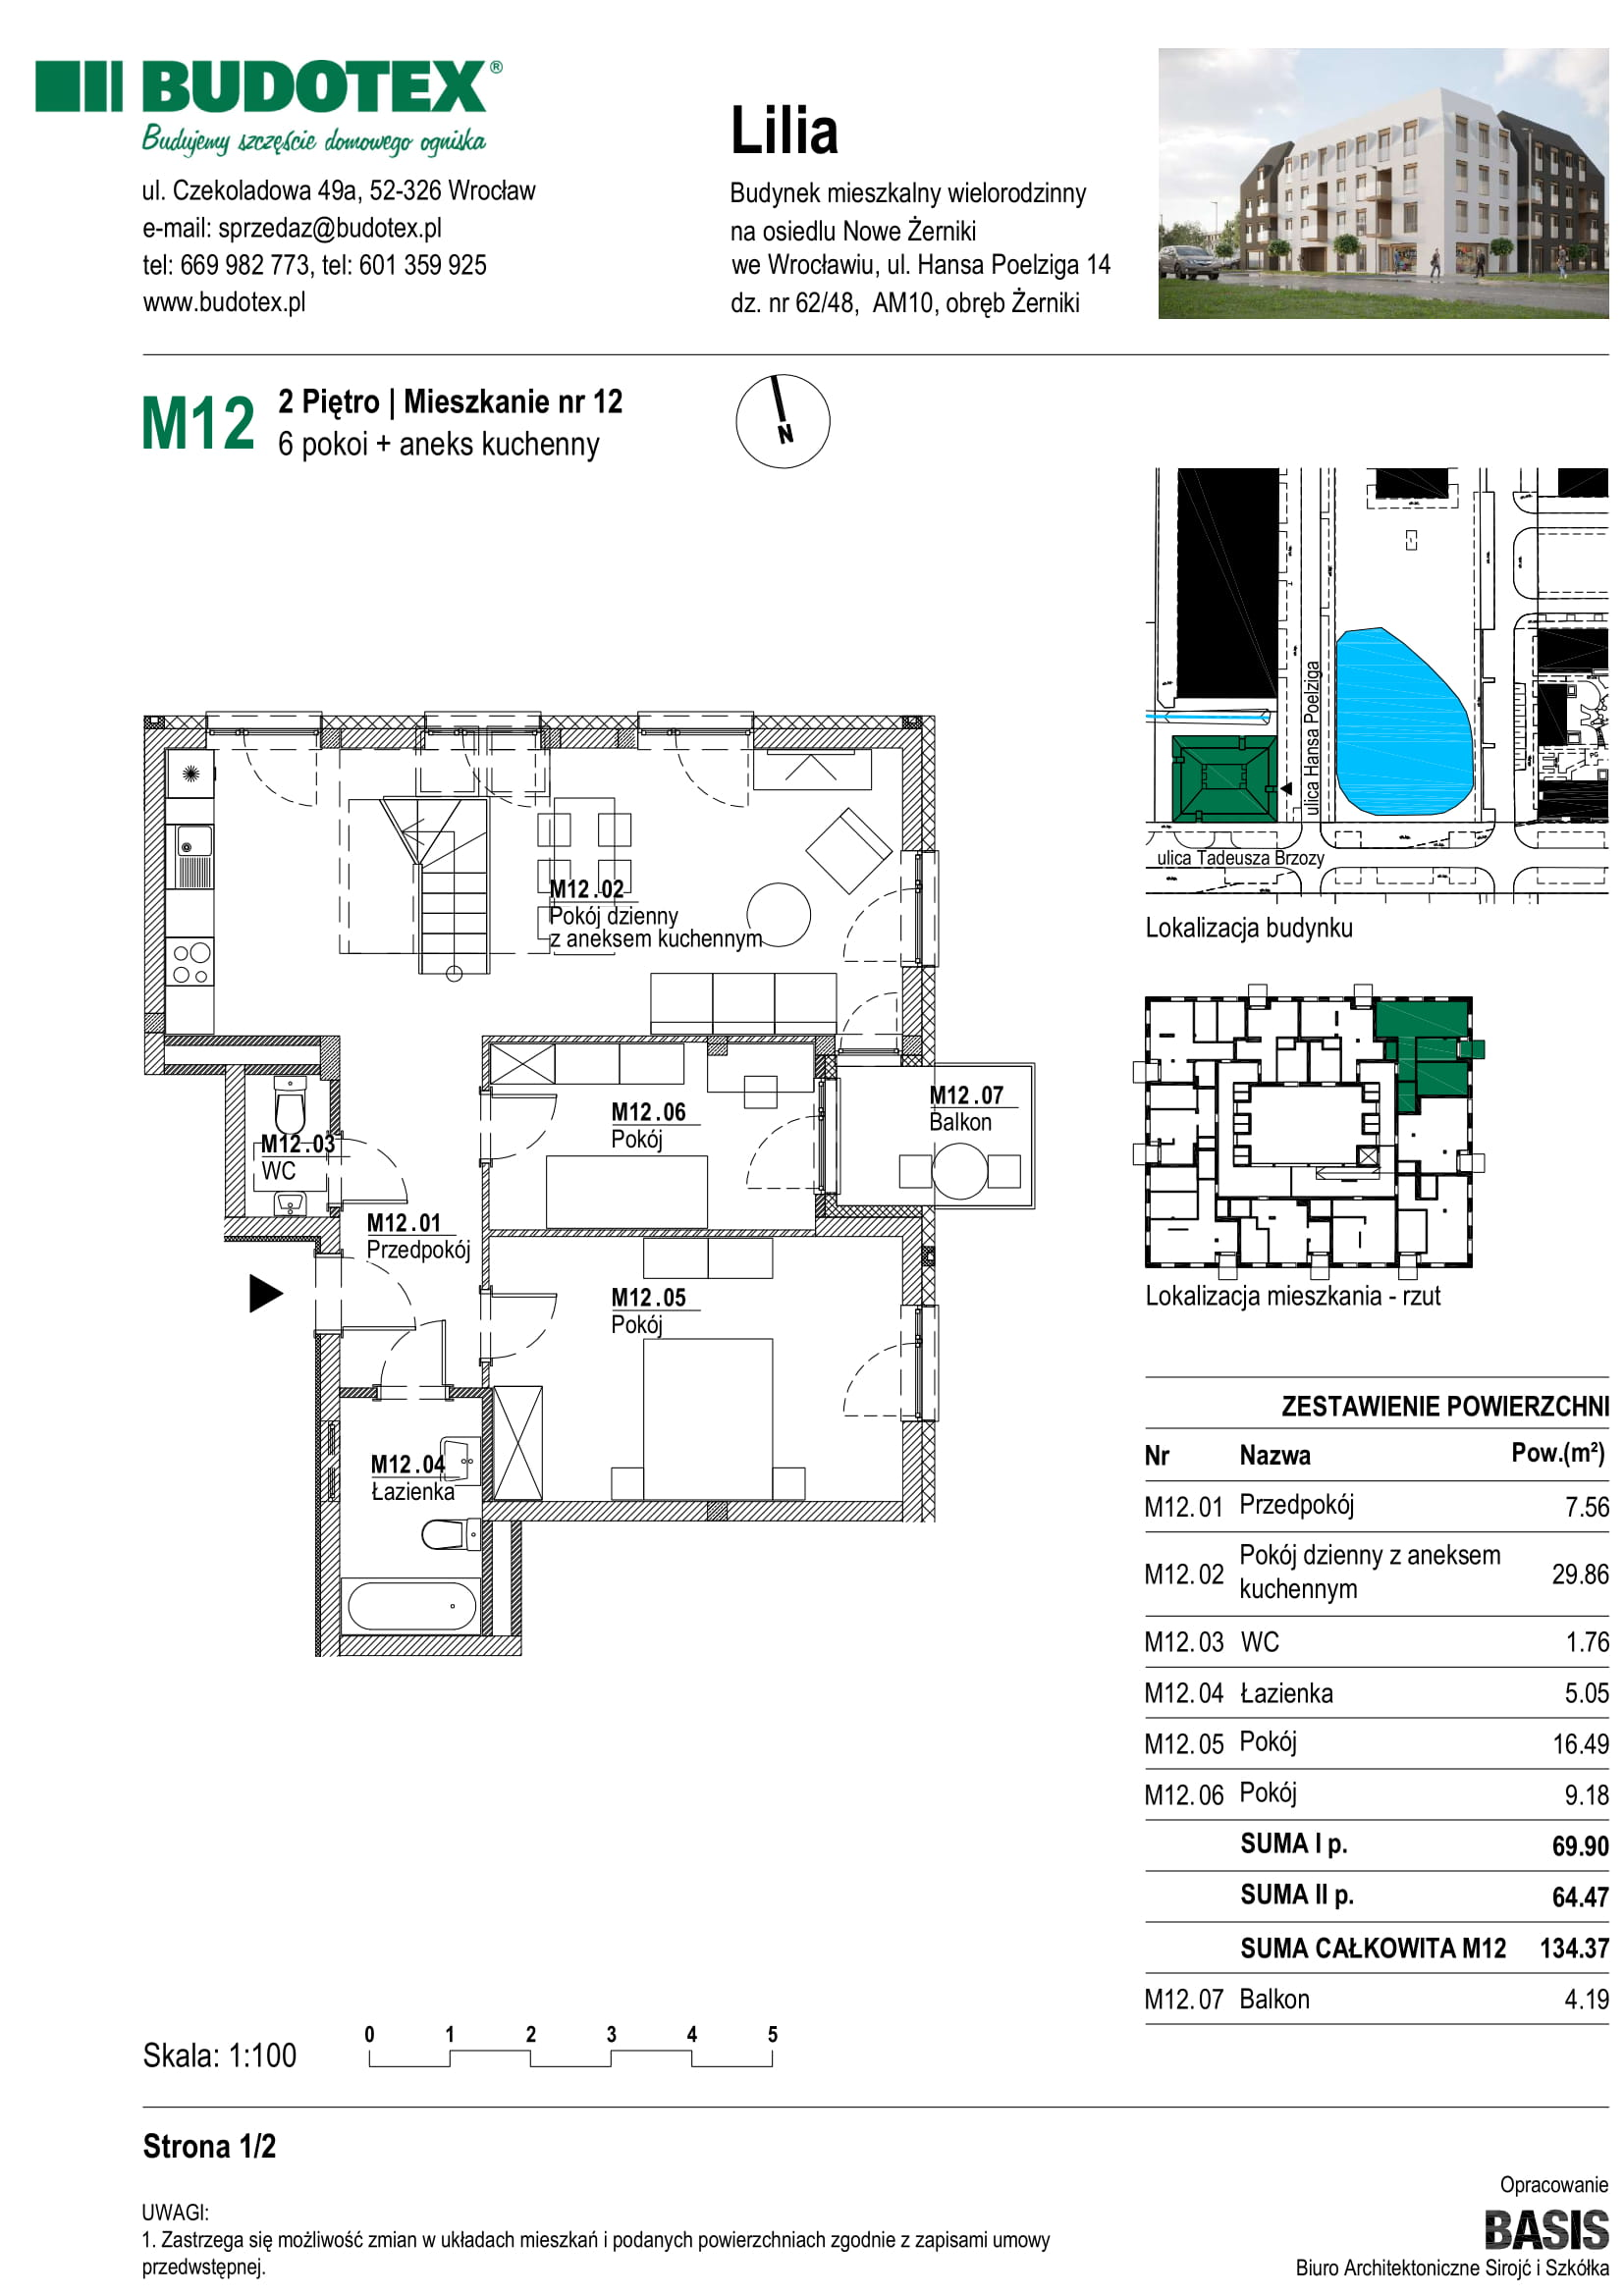 Mieszkanie nr M12